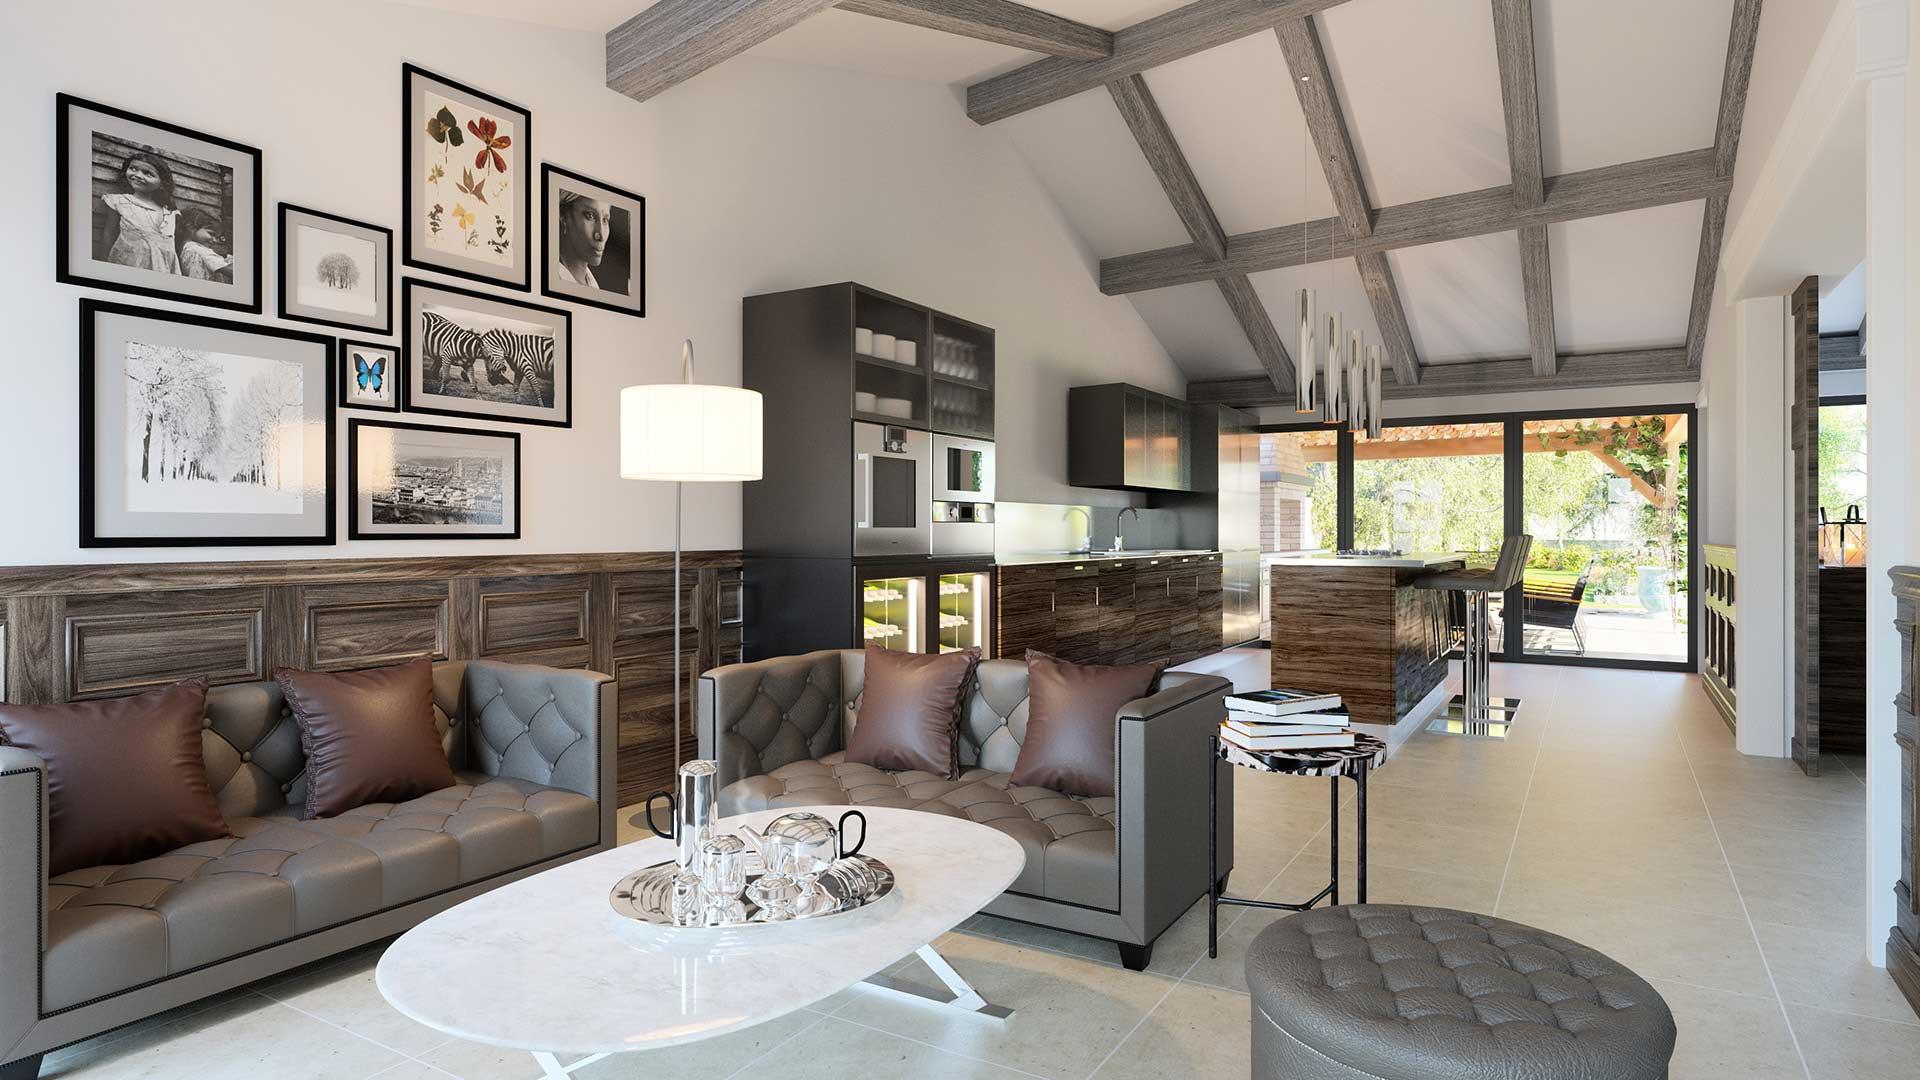 3D Photo for the living room of this luxurious villa in Île-de-Ré.